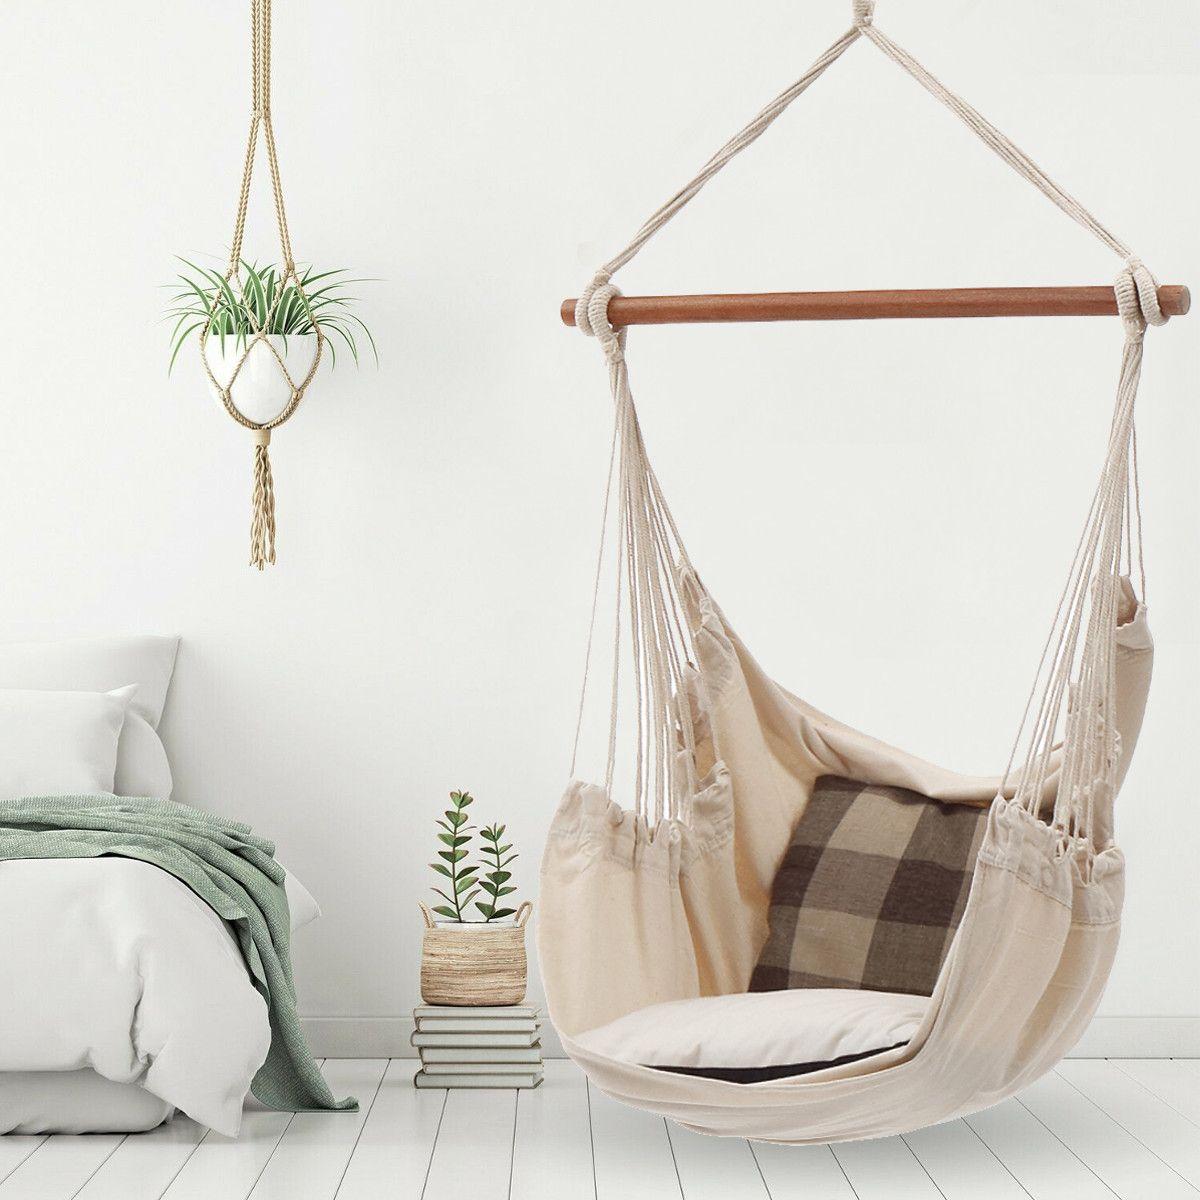 Patio Garden Hammock Swing Chair Bedroom Hanging Chair Hammock Chair